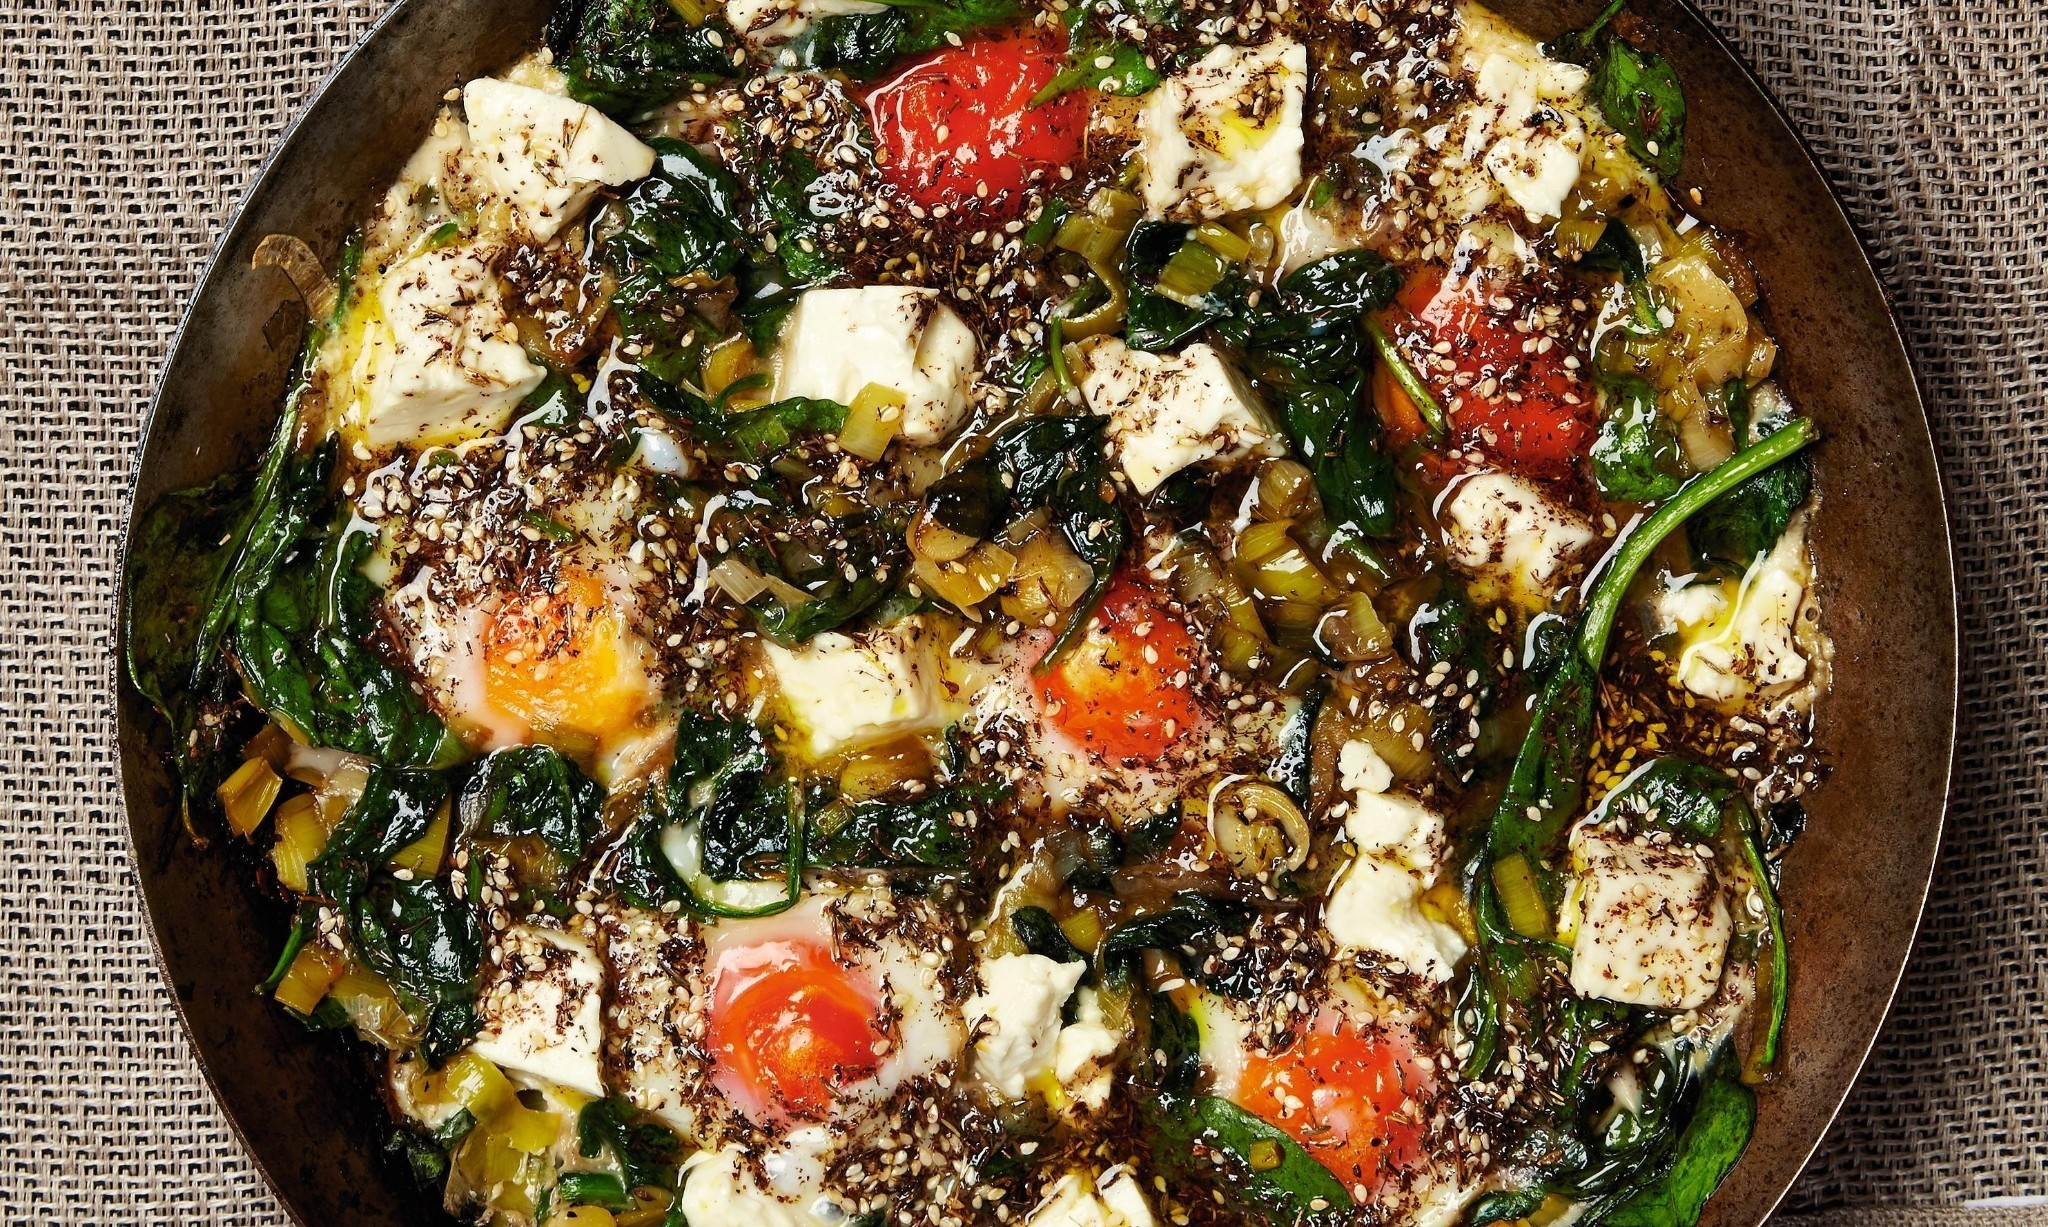 It's a cracker: Yotam Ottolenghi's braised egg recipes